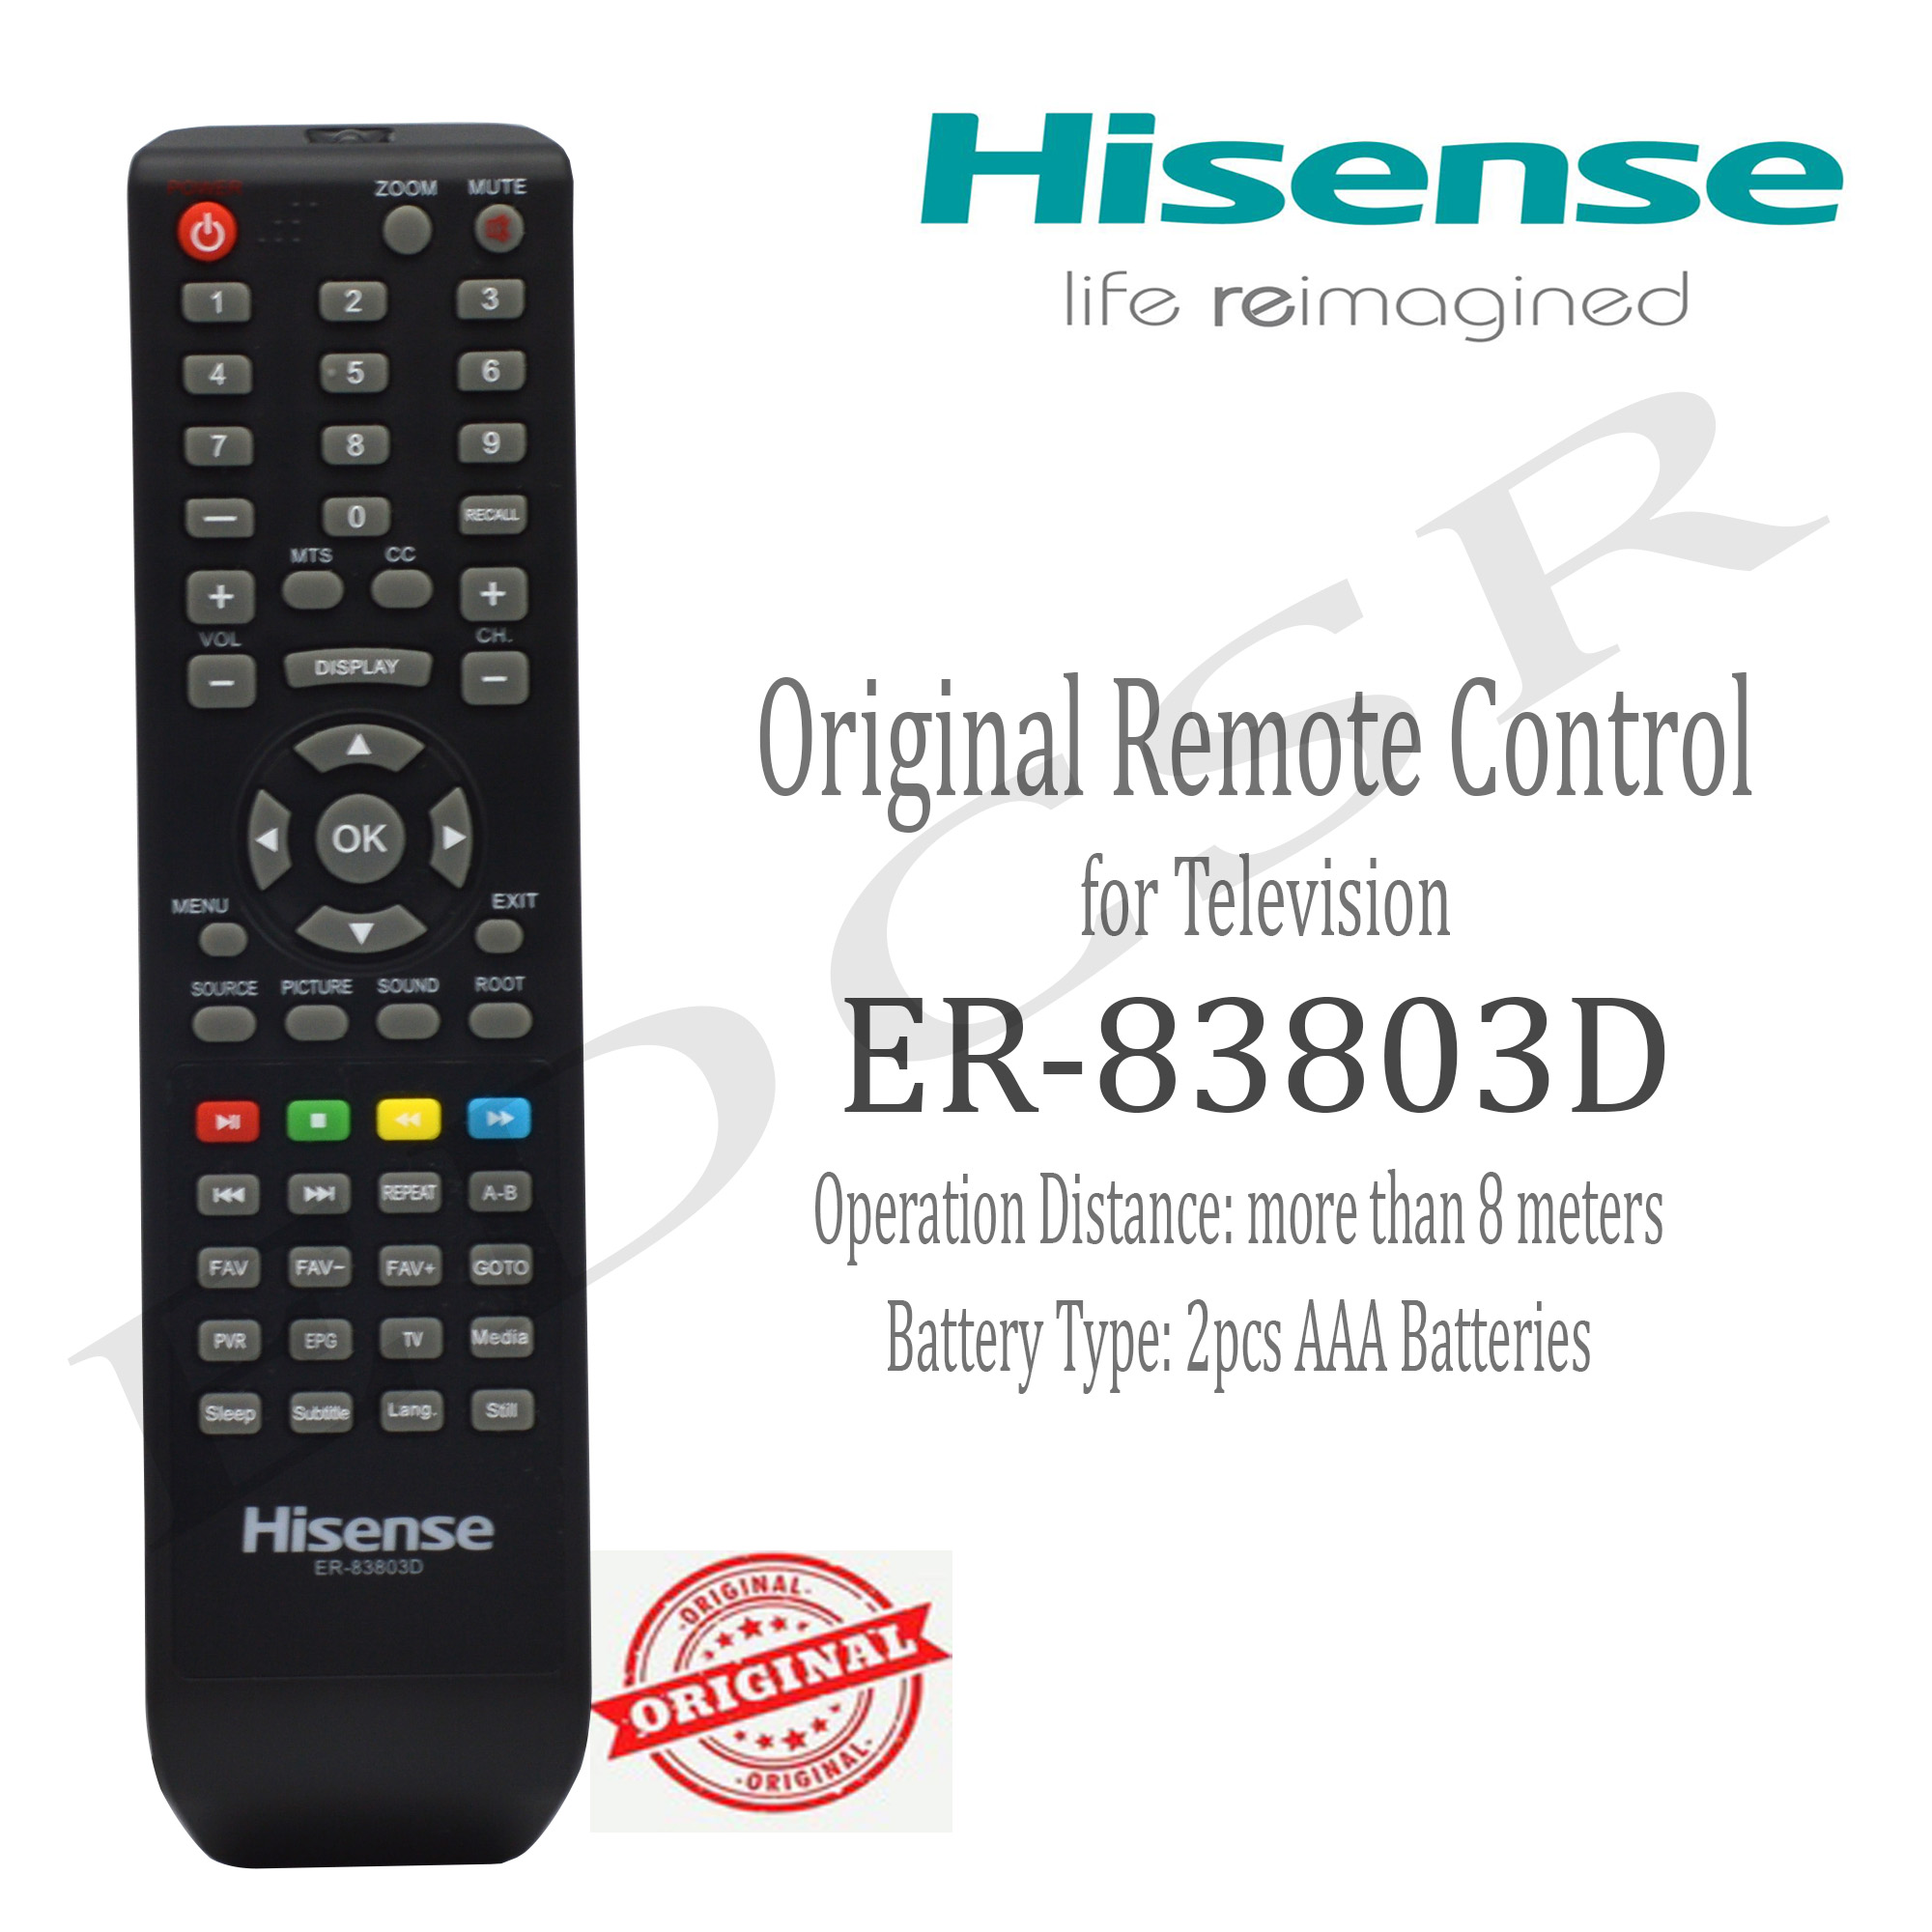 Hisense - ER-83803D - Original Remote Control for Television